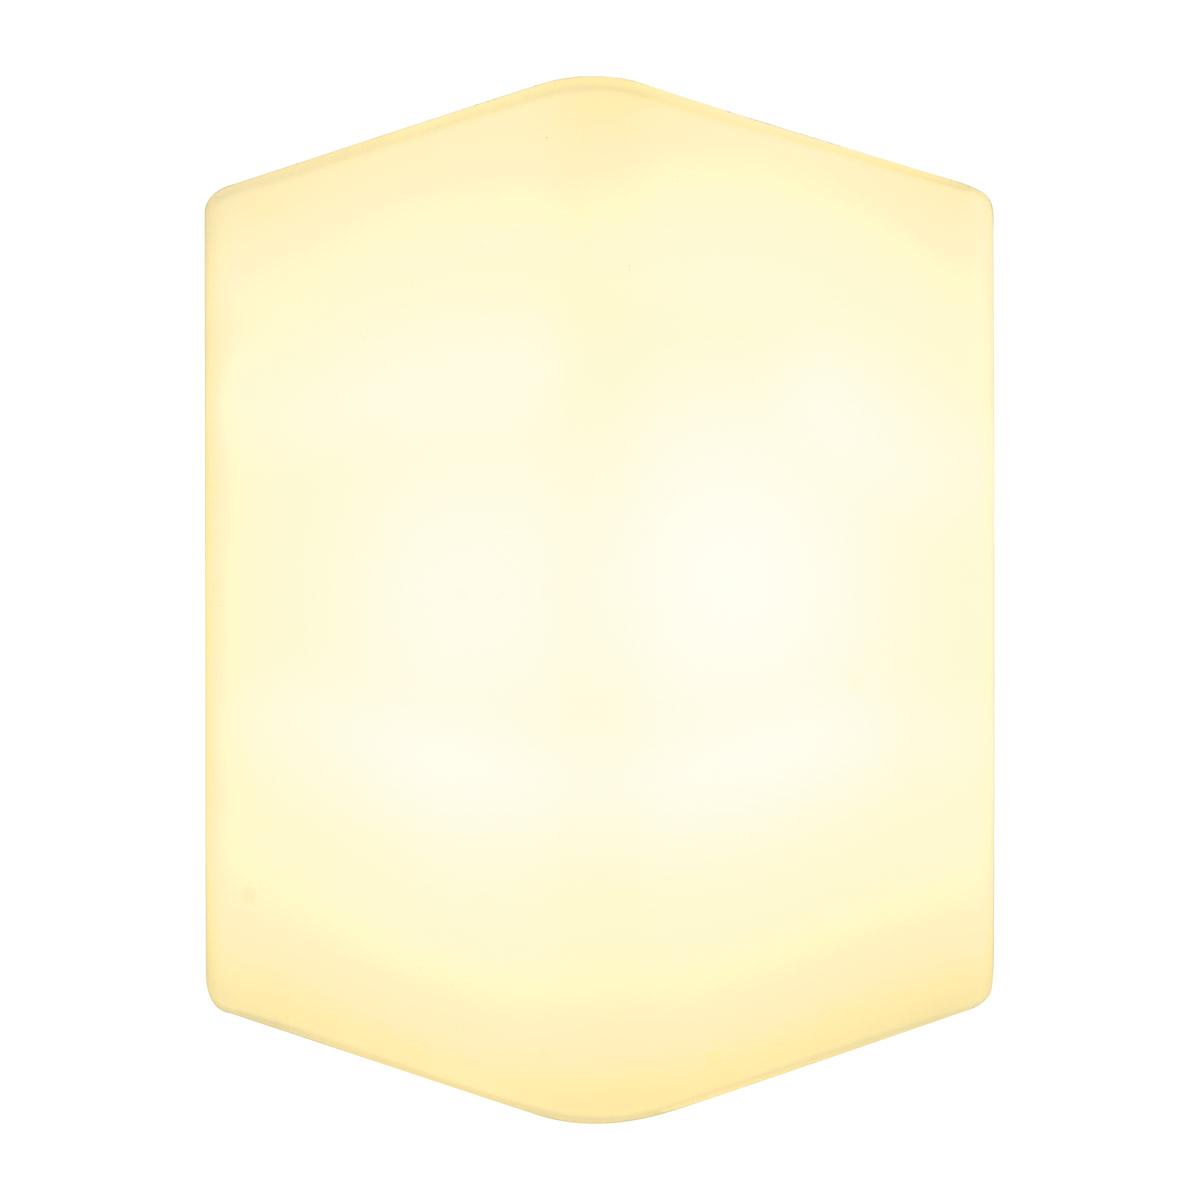 1 Stk CARISO, LED  Wandleuchte Glas, 7,5W LED, 3000K, weiß LI151722--